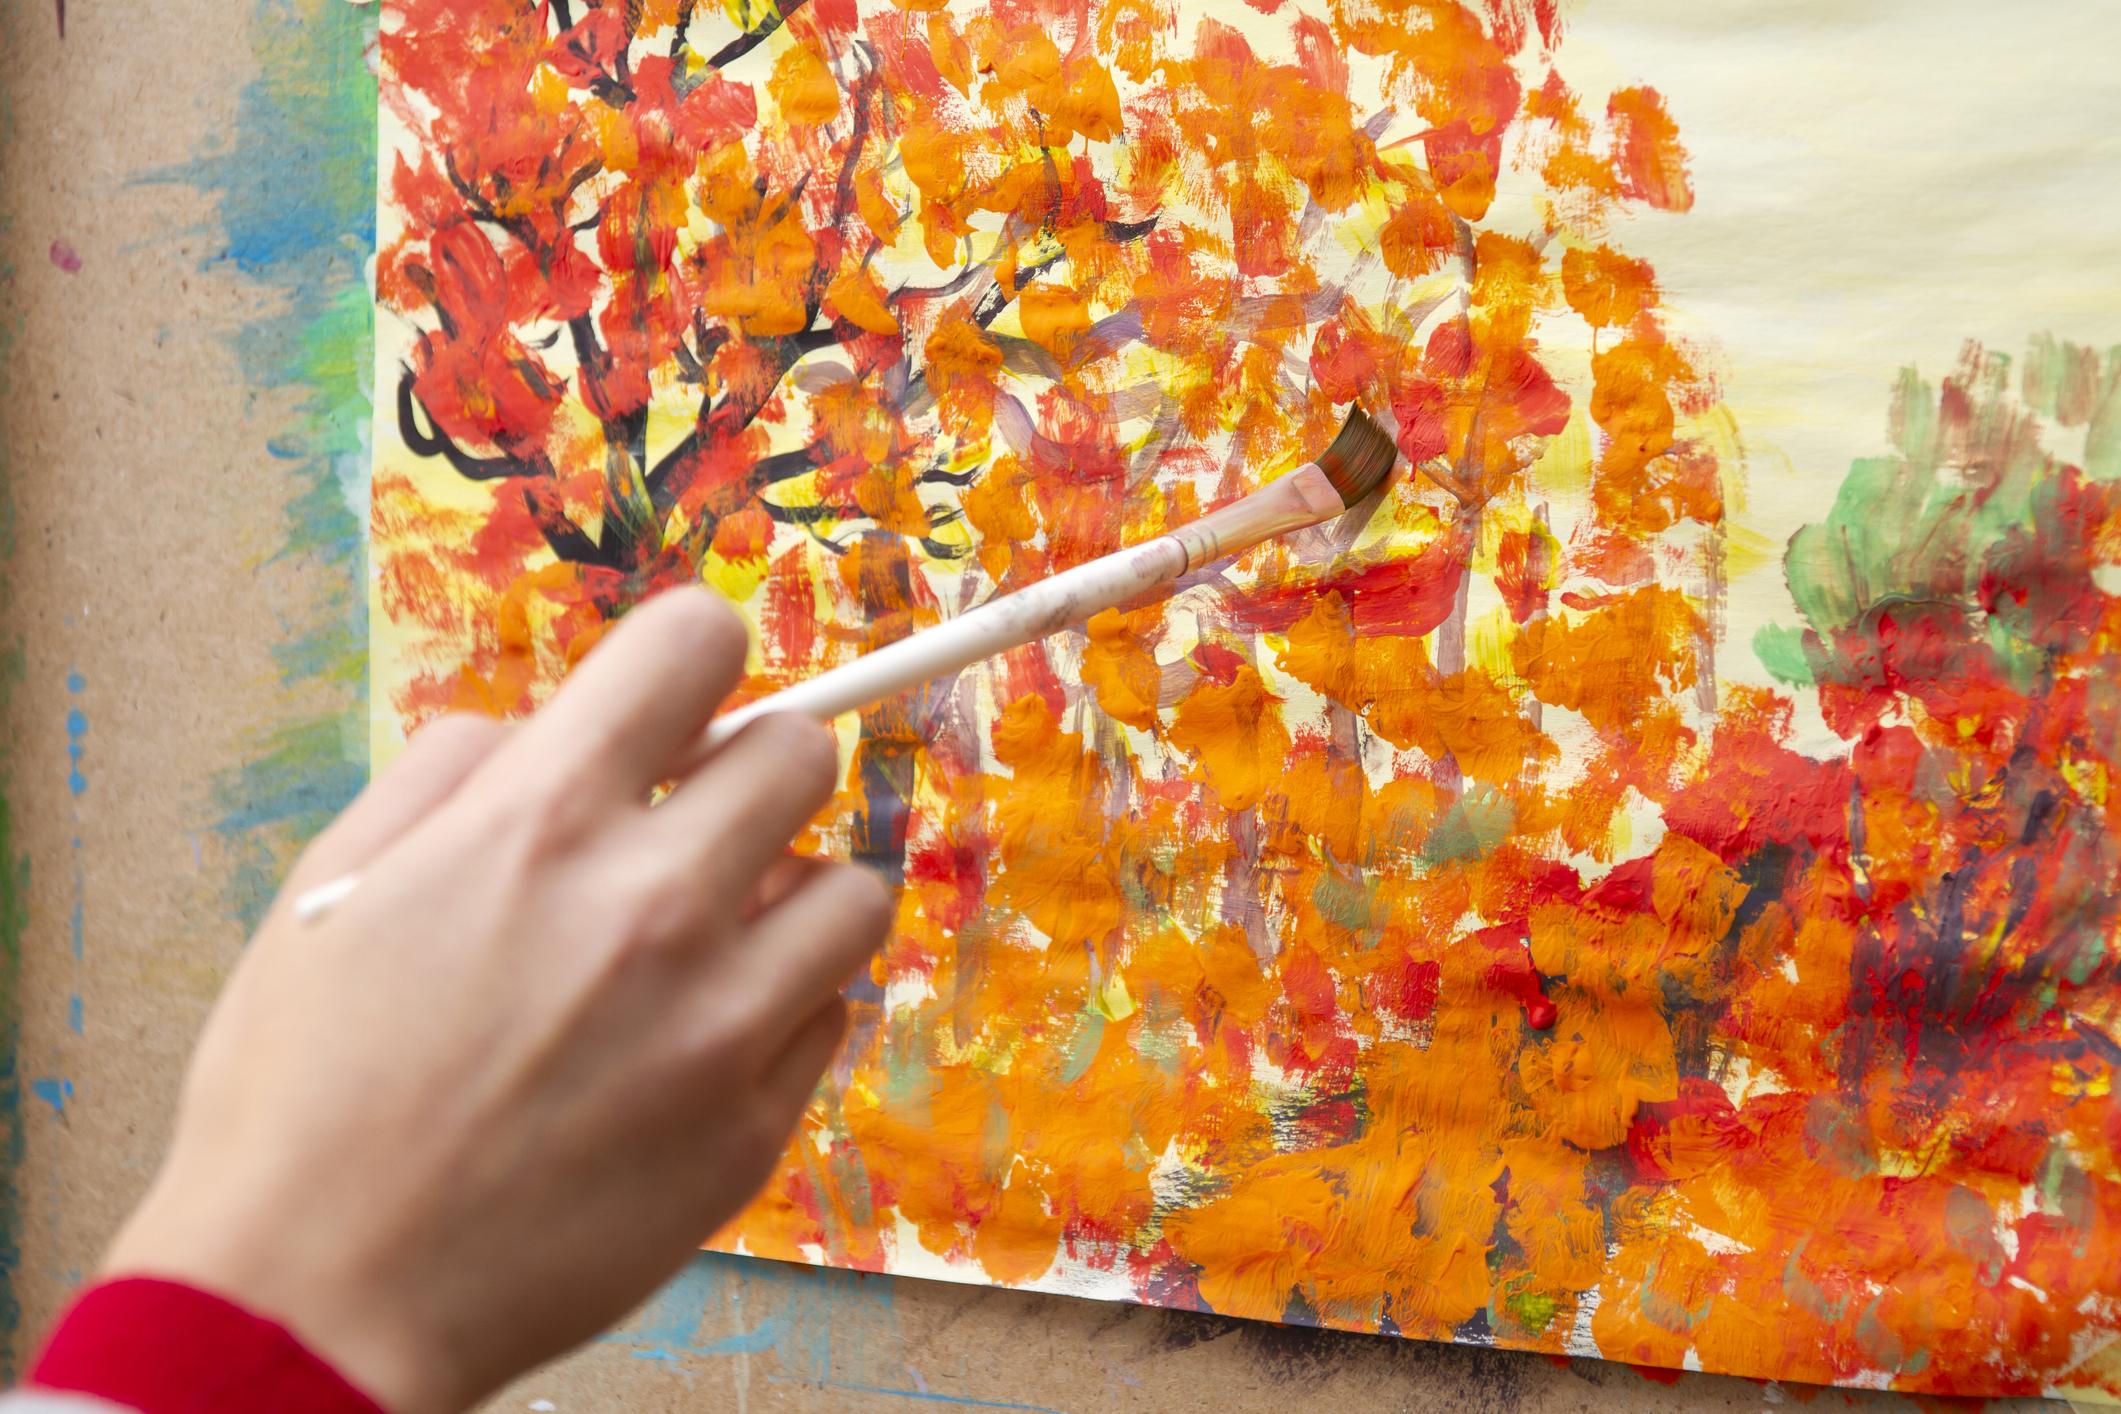 Young artist paints orange autumn trees on canvas